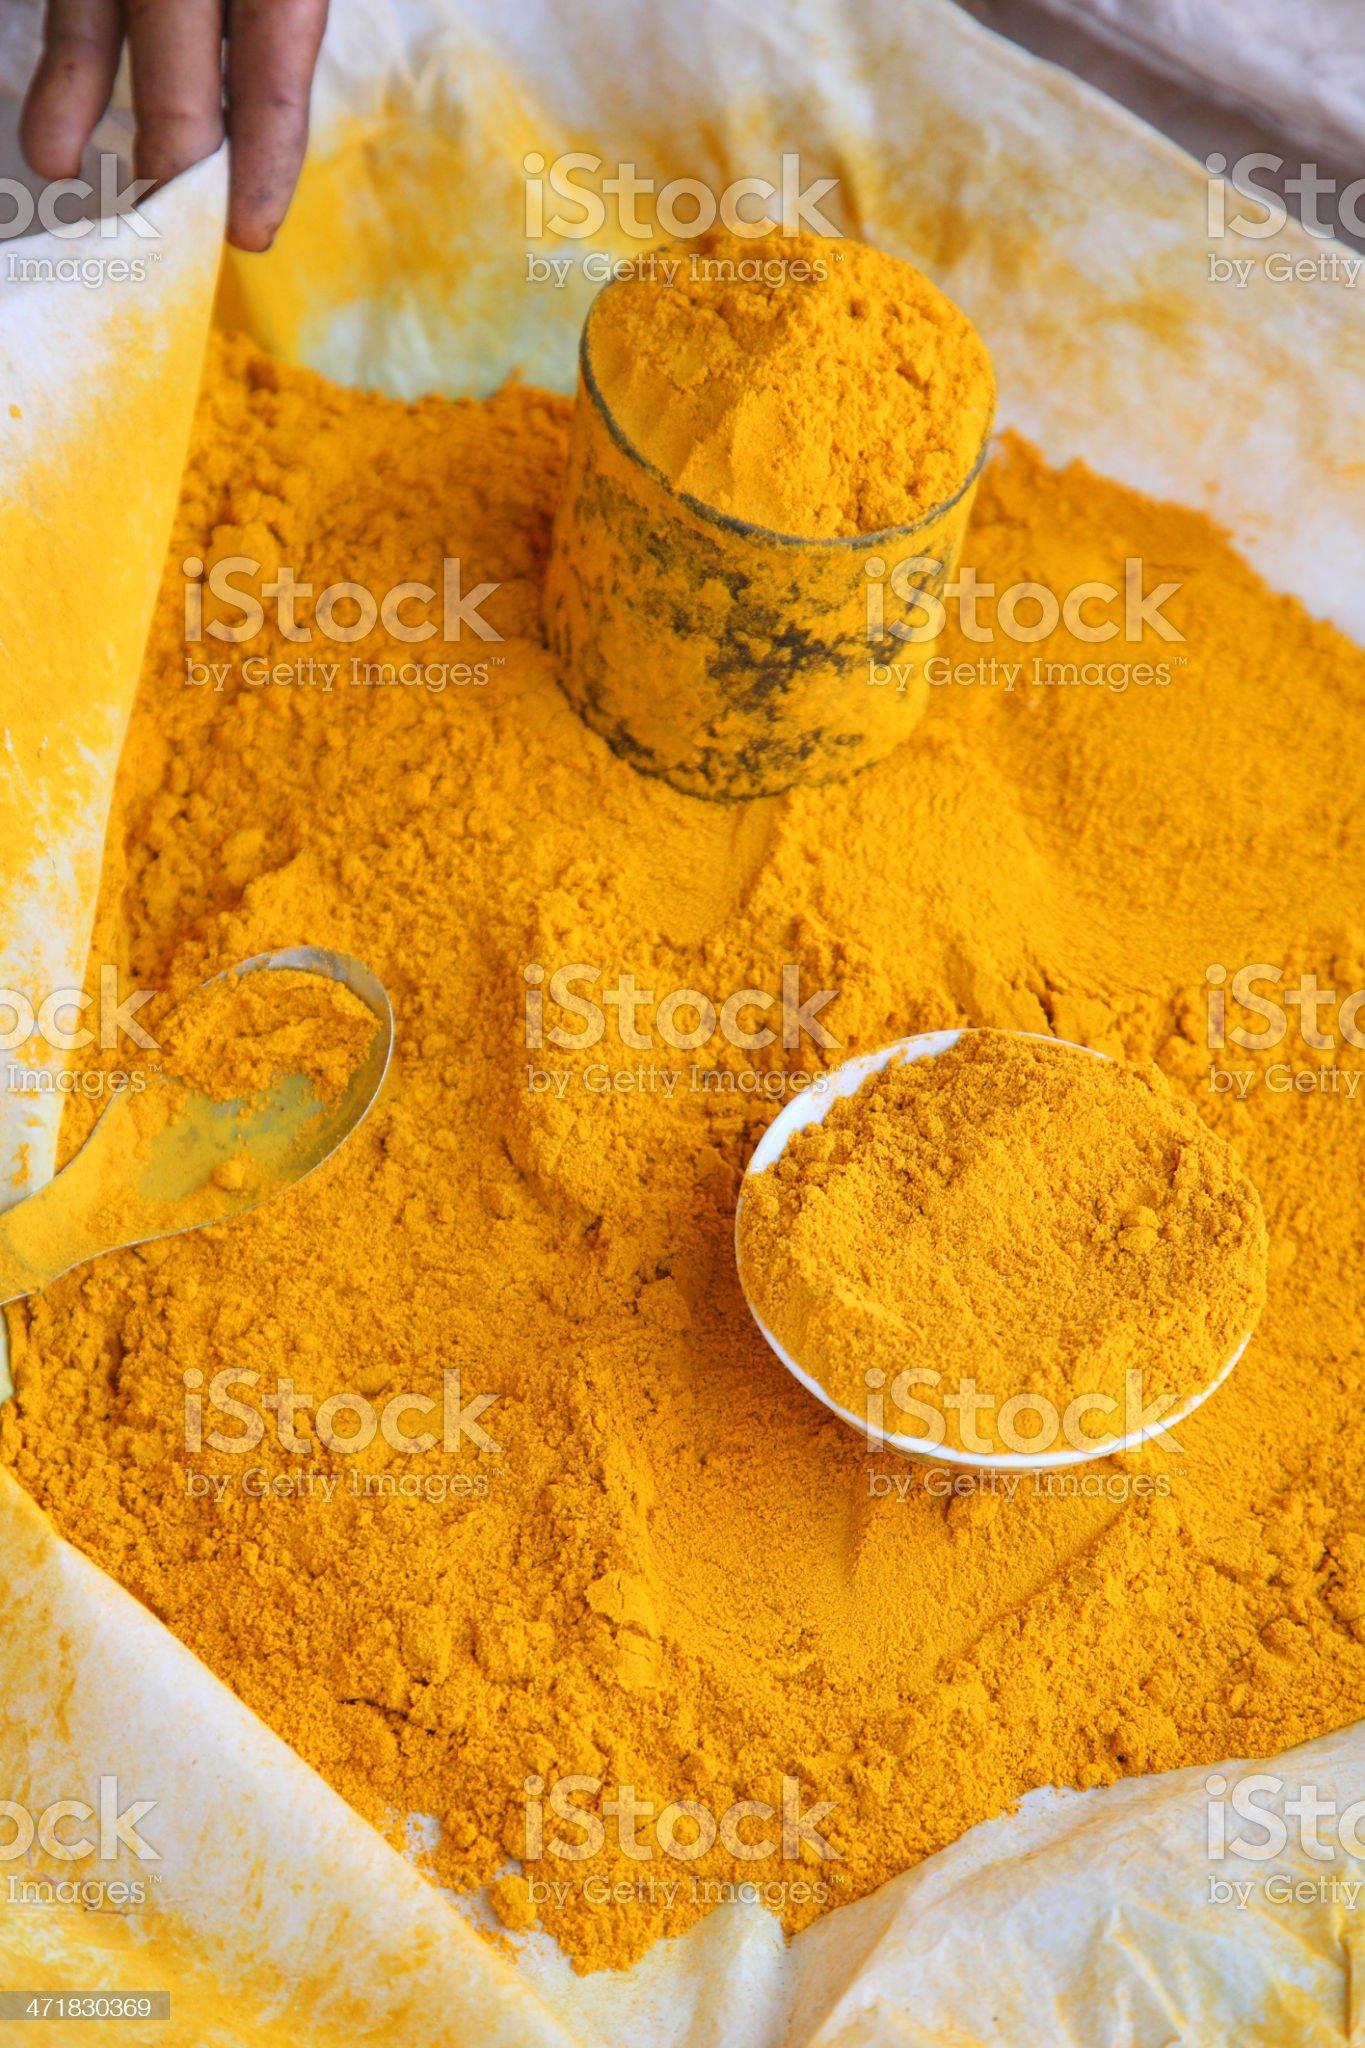 turmeric powder from vegetable market. royalty-free stock photo